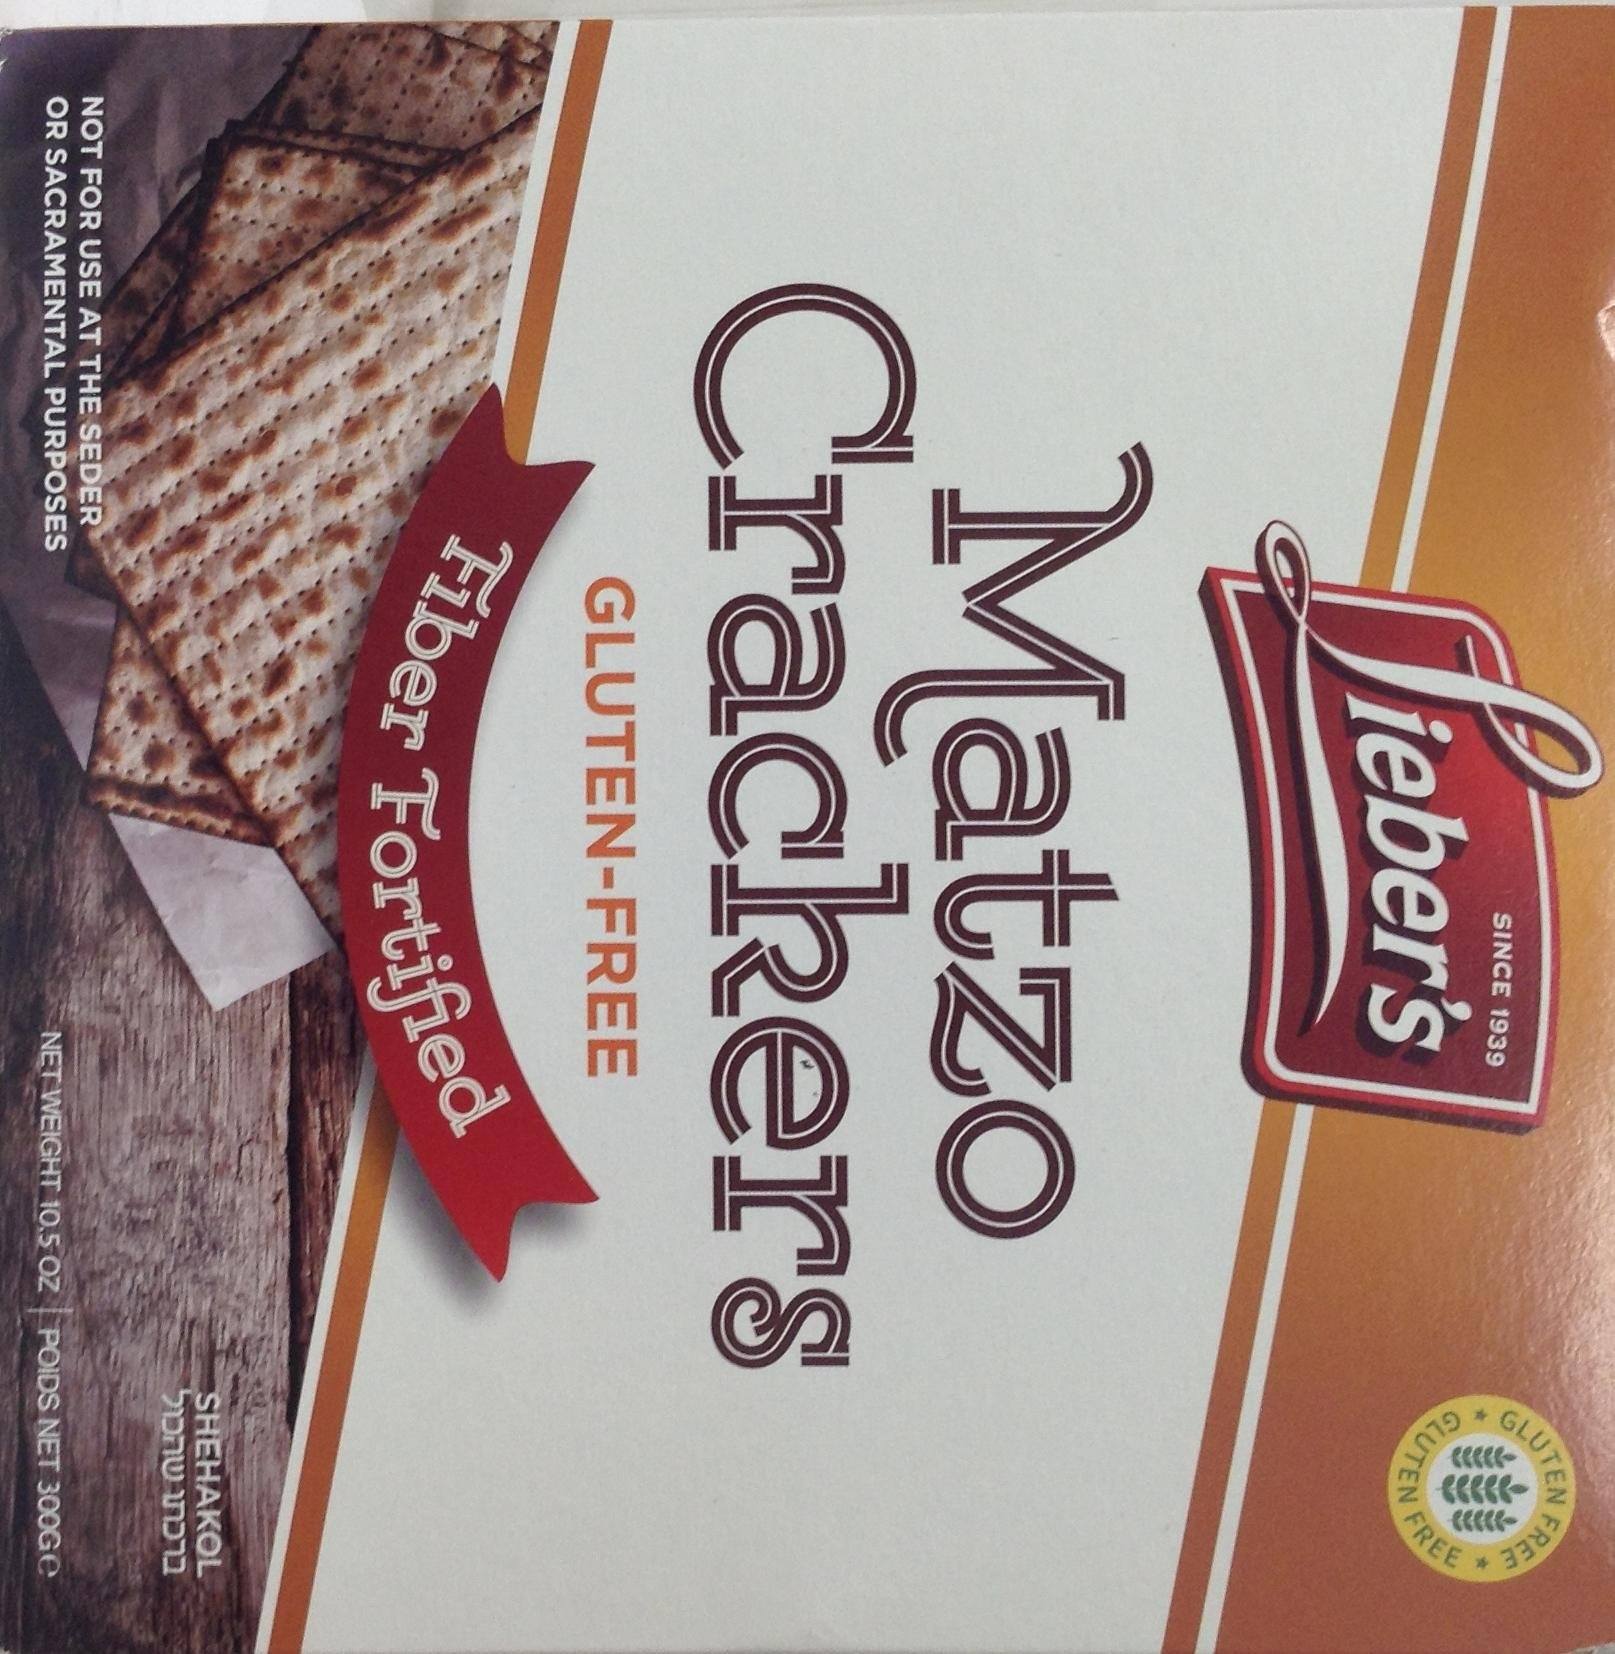 Lieber's Gluten Free Fiber Fortified Matzo Crackers Kosher For Passover - Pack of 6